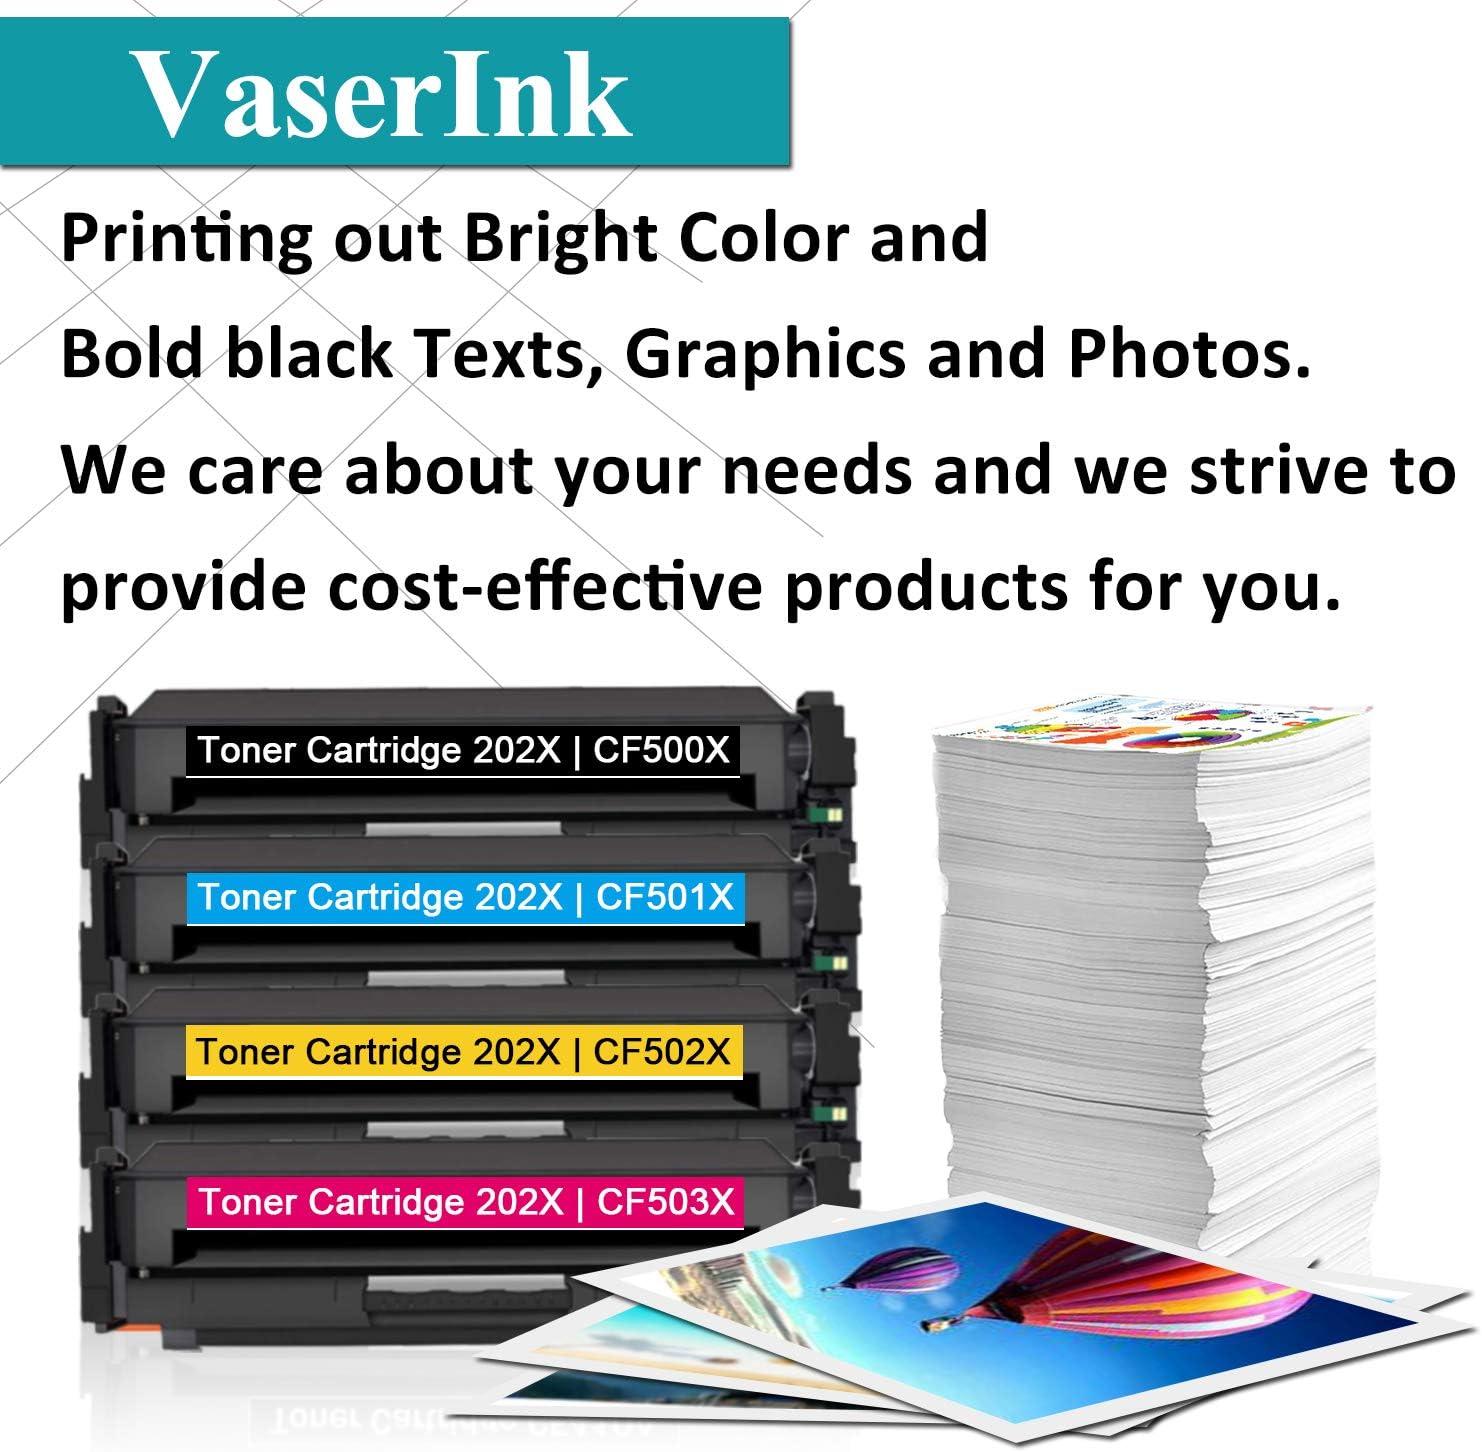 CF500X CF501X CF502X CF503X Toner Cartridge Compatible for HP Color Laserjet Pro MFP M280nw M281fdn M281fdw M281cdw Pro M254nw M254dw M254dn 4BK//1C//1Y//1M High Yield 202X 7 Pack by VaserInk